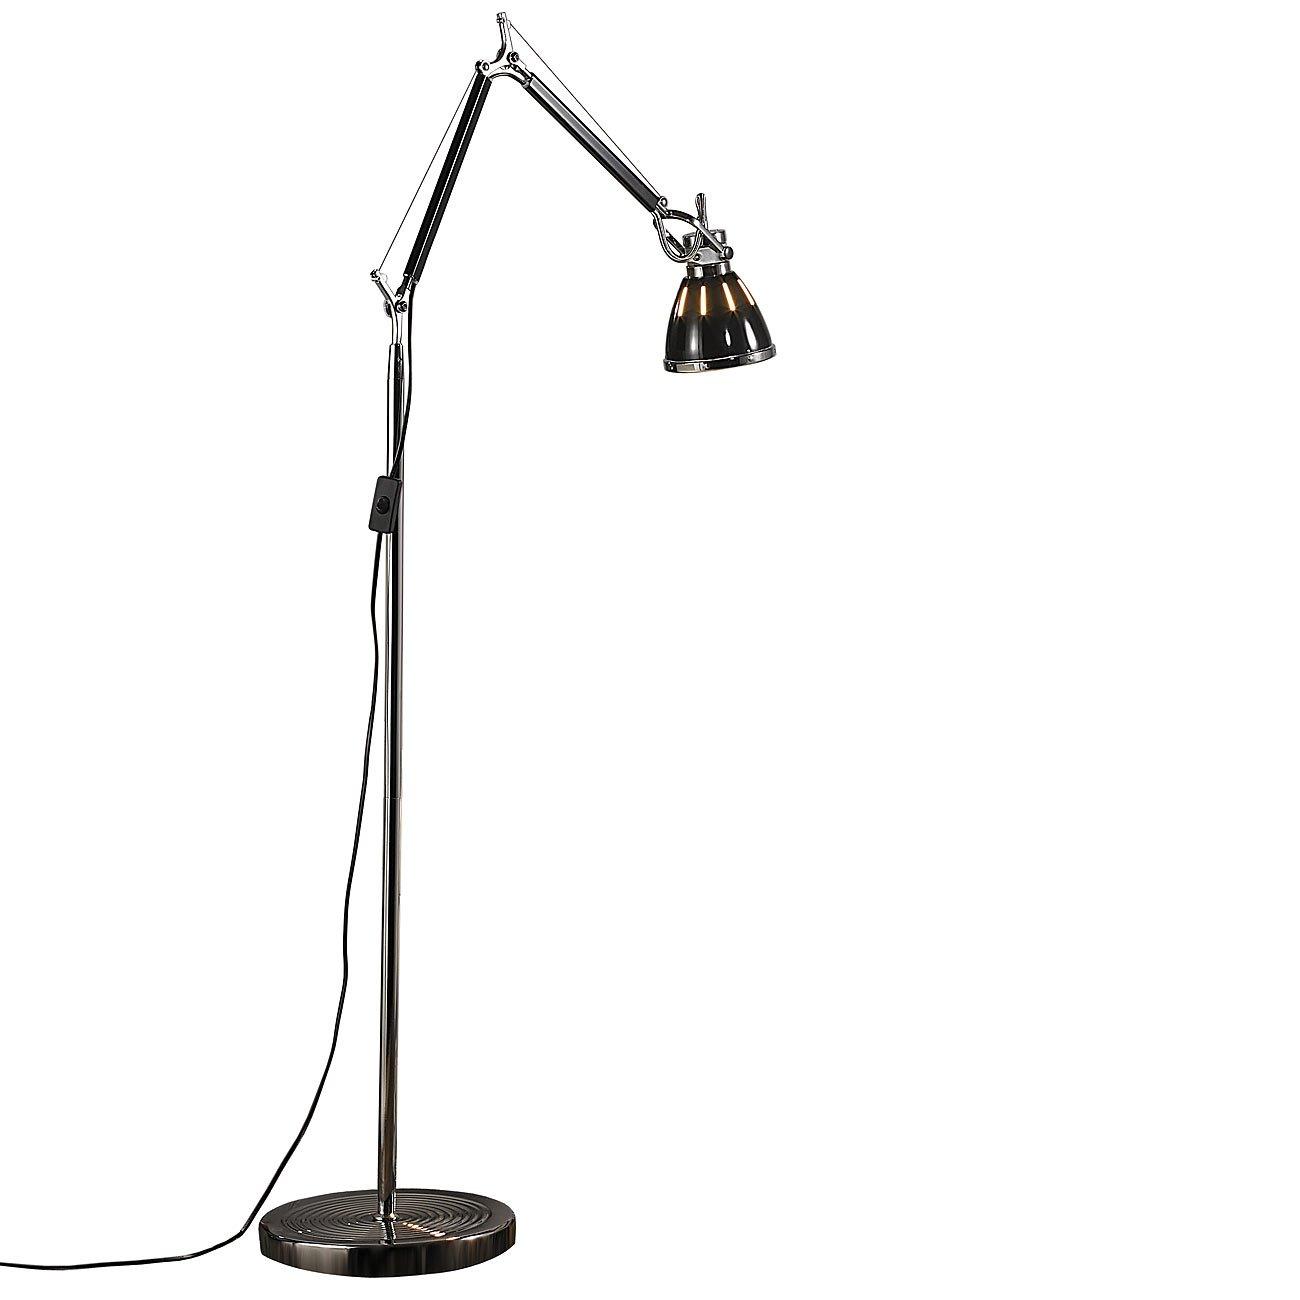 Lunartec Stehlampe  Elegante Retro-Stehleuchte warmweiß im SMD-LED-Stromsparpaket (LED Stehlampe)